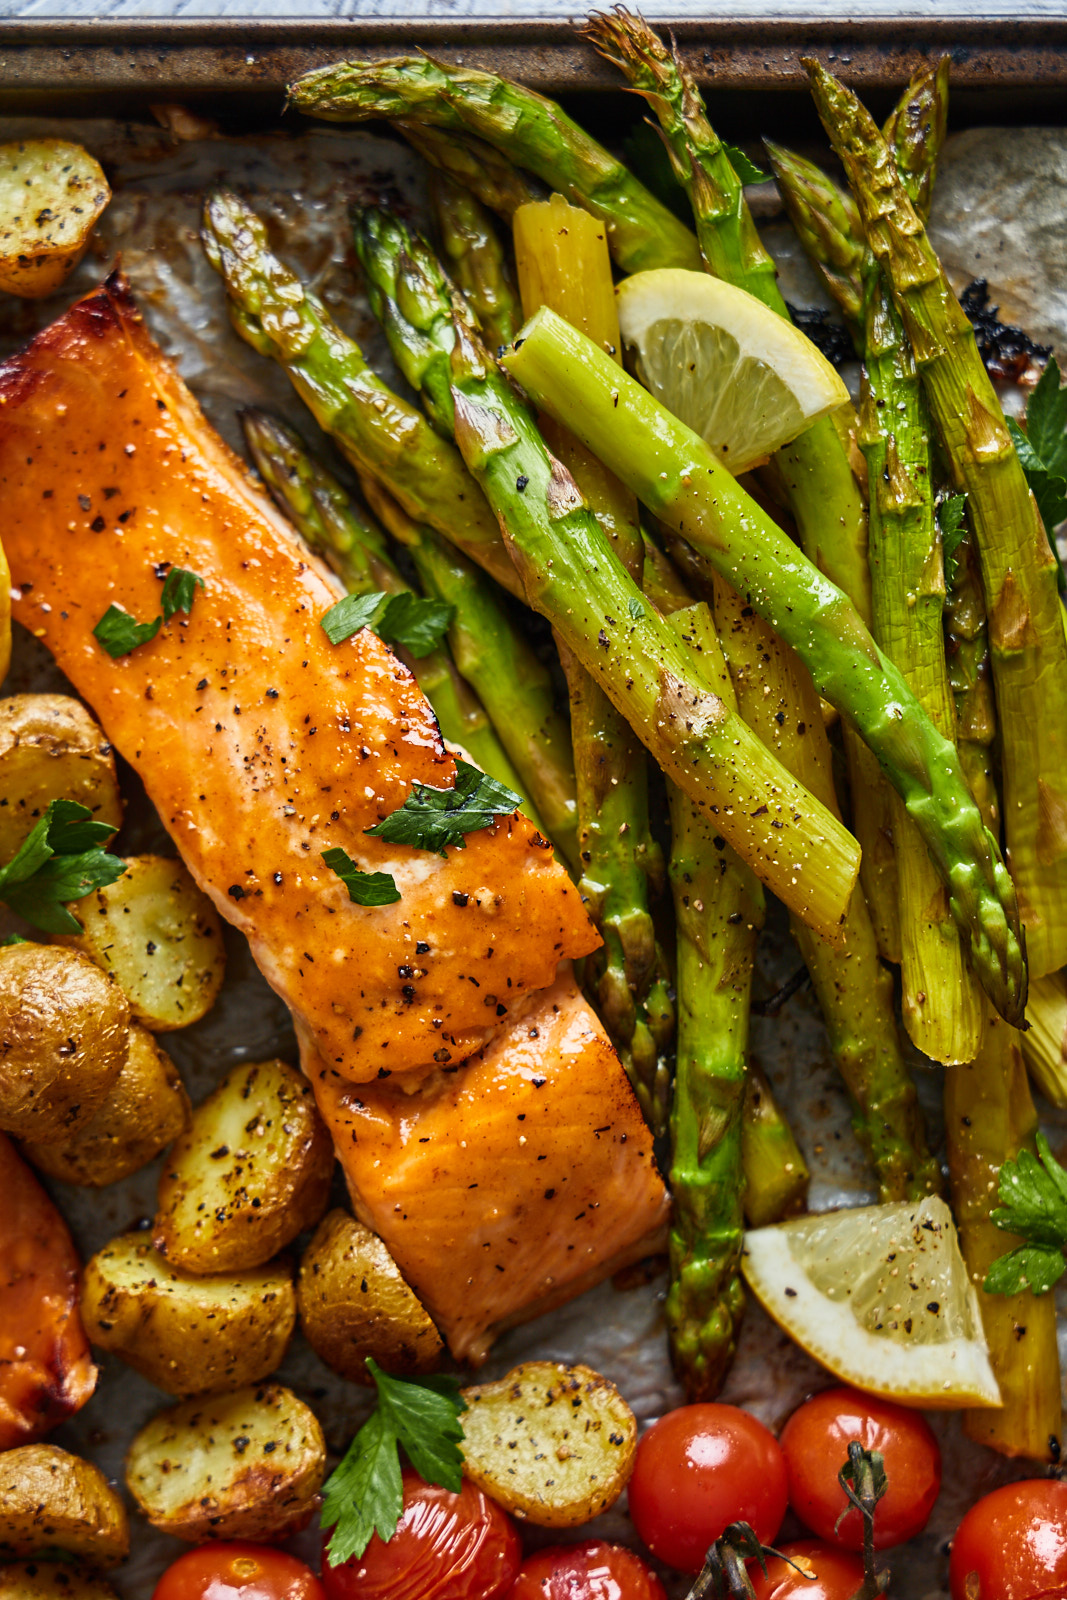 Sheetpan Salmon and Potatoes With Veggies